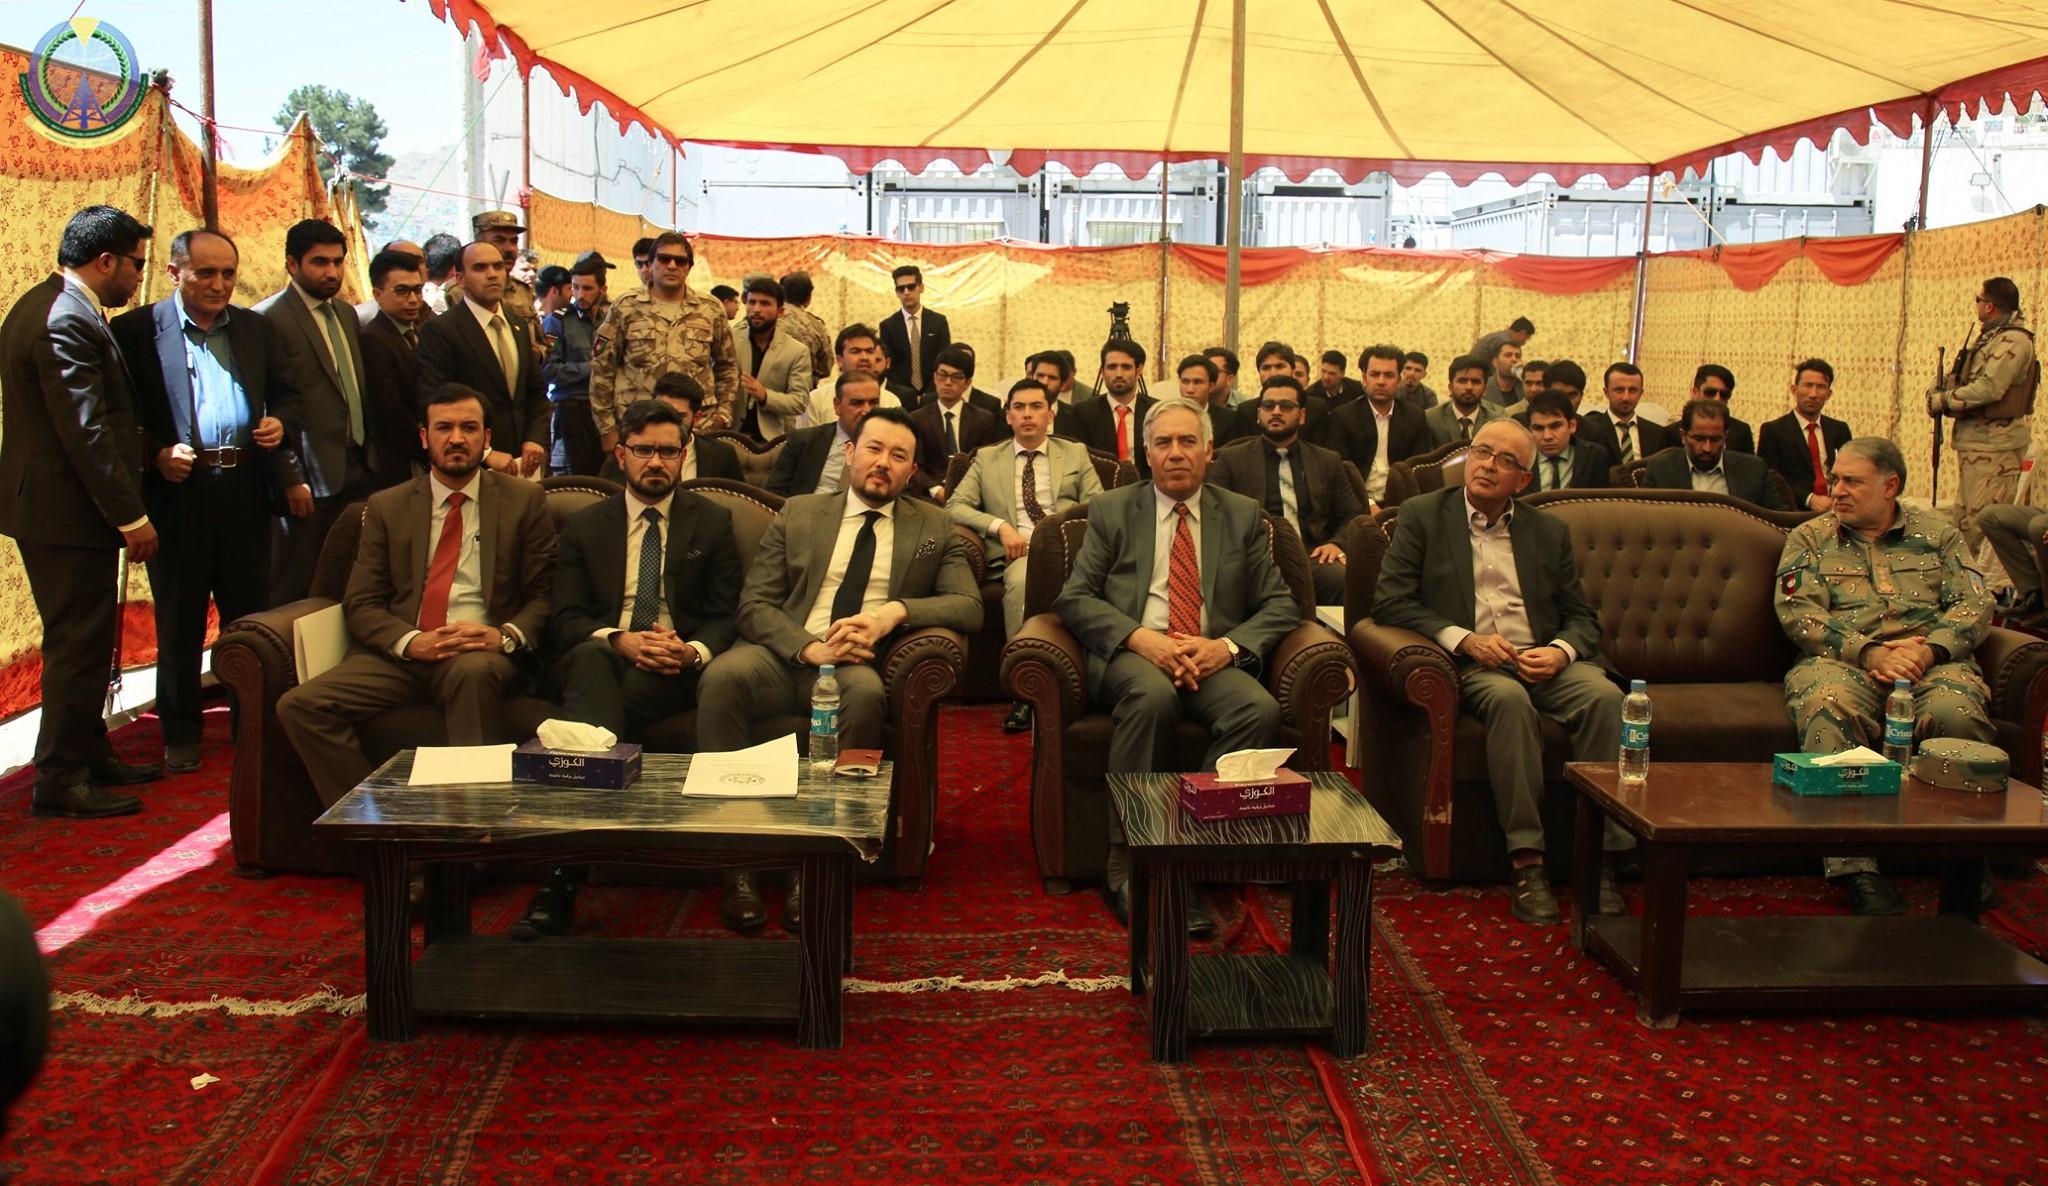 سنگ تهداب پروژۀ مطبعۀ اسناد مصئون افغانستان گذاشته شد